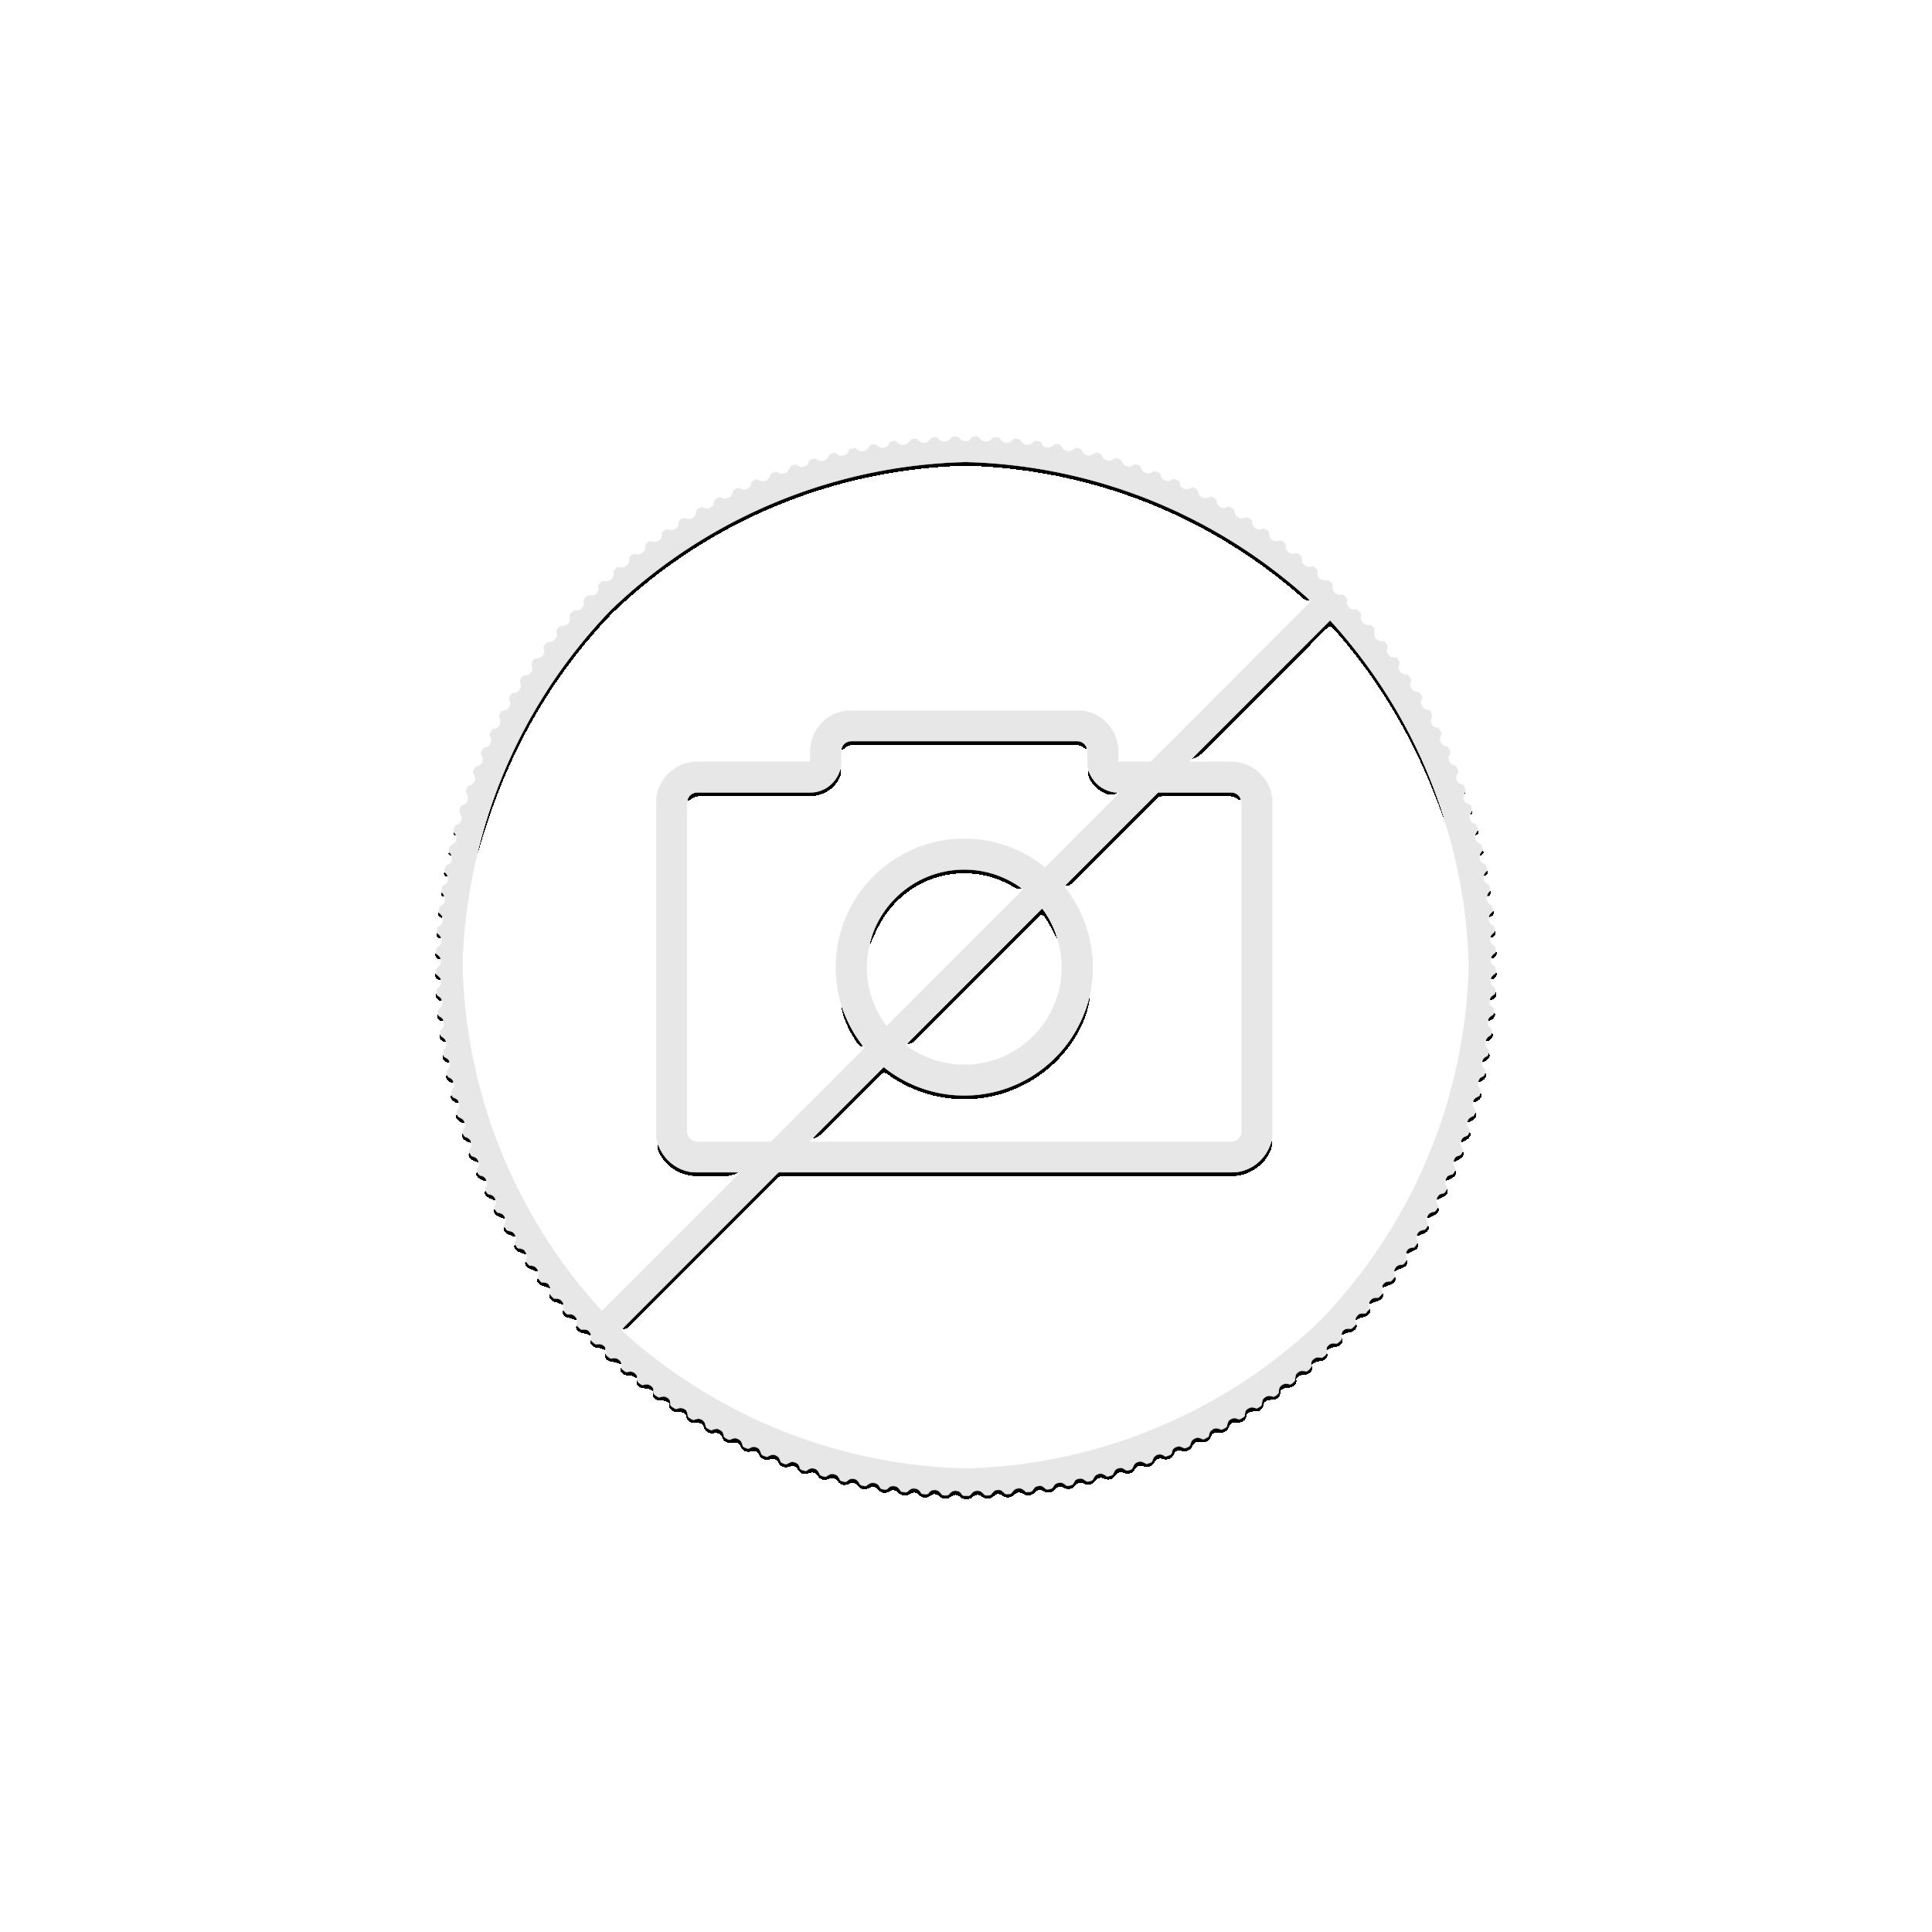 Gouden 99,999% Maple Leaf munt 2008 blister achterzijde